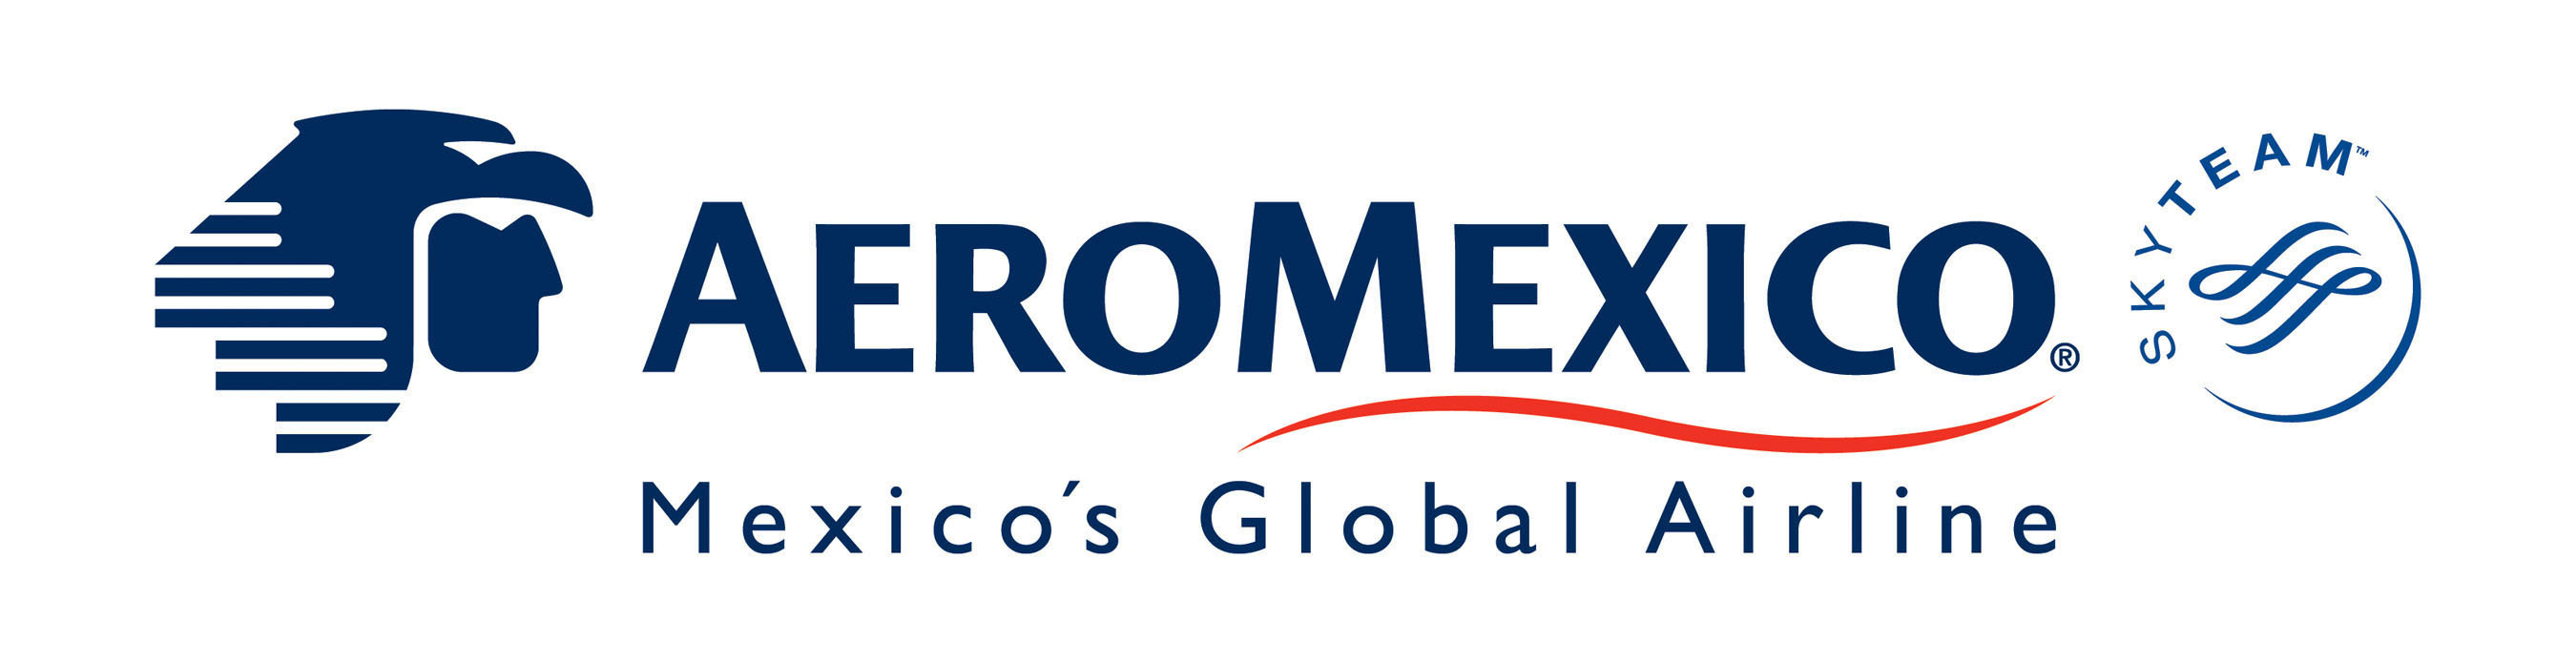 Aeromexico Logo. (PRNewsFoto/Aeromexico) - Aeromexico Skyteam PNG